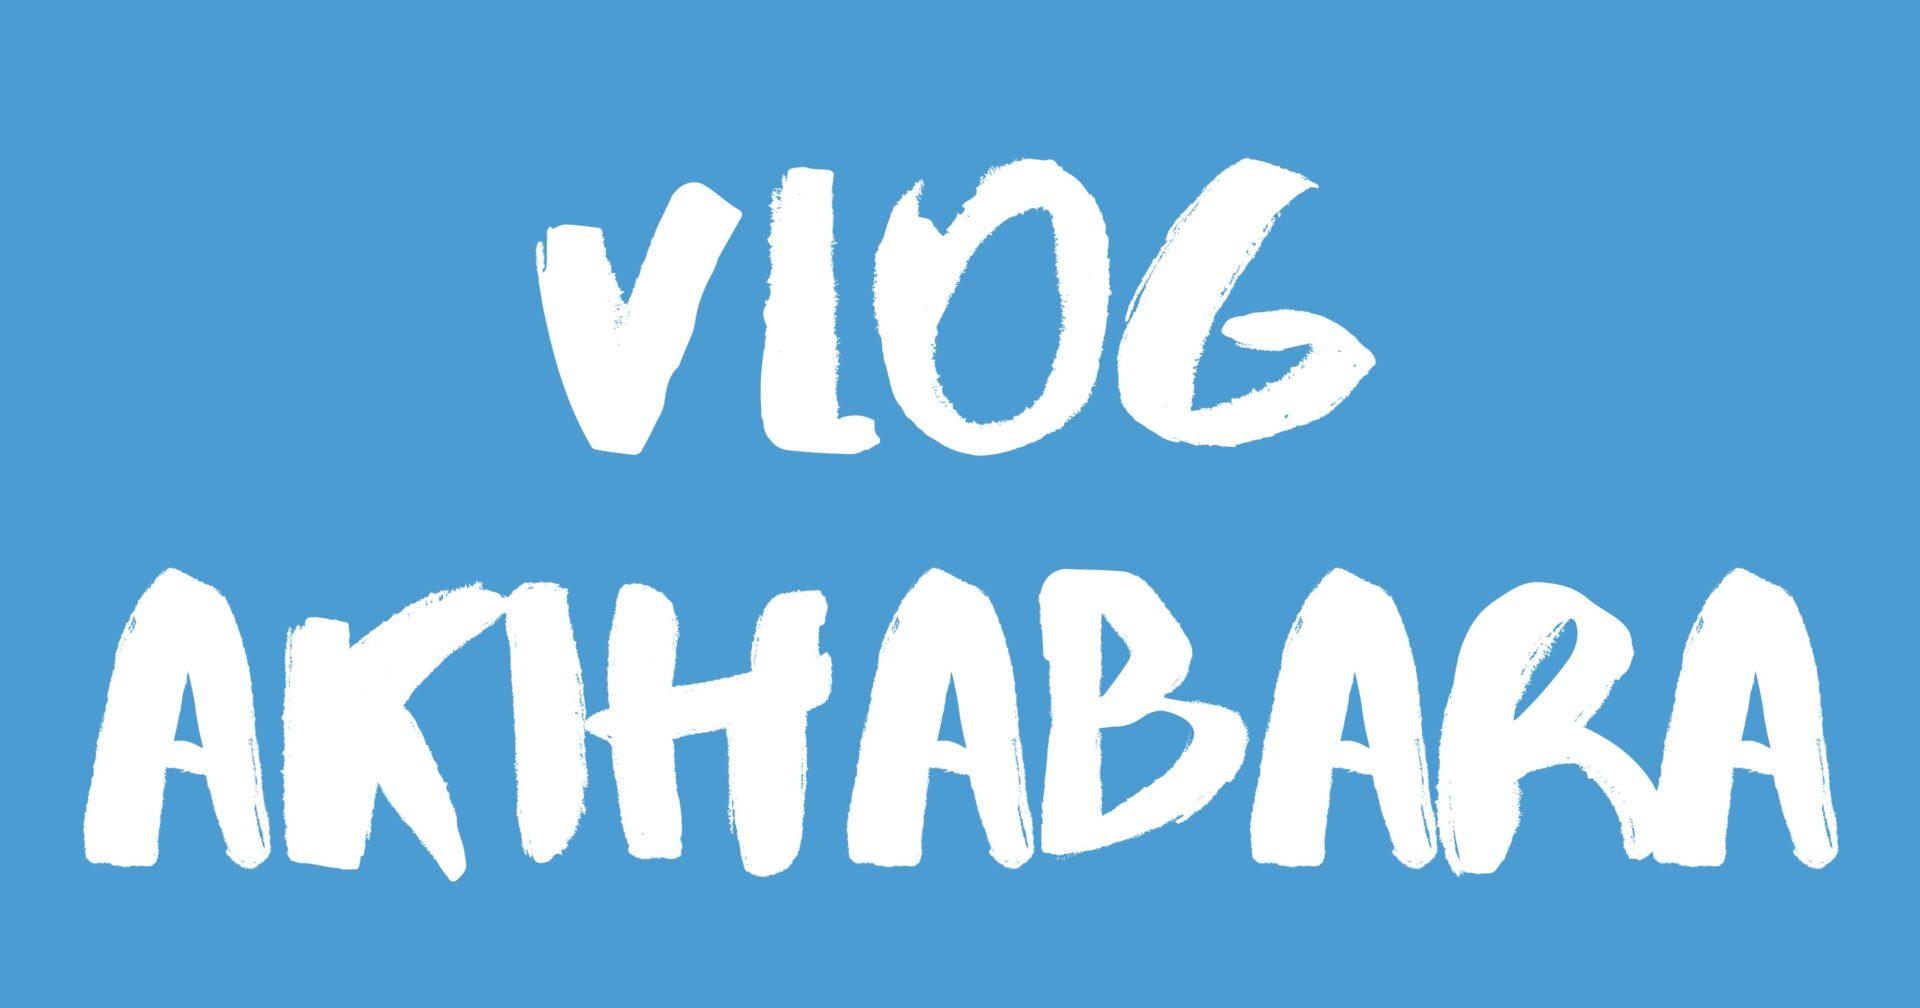 [Vlog] 秋葉原 / Akihabara